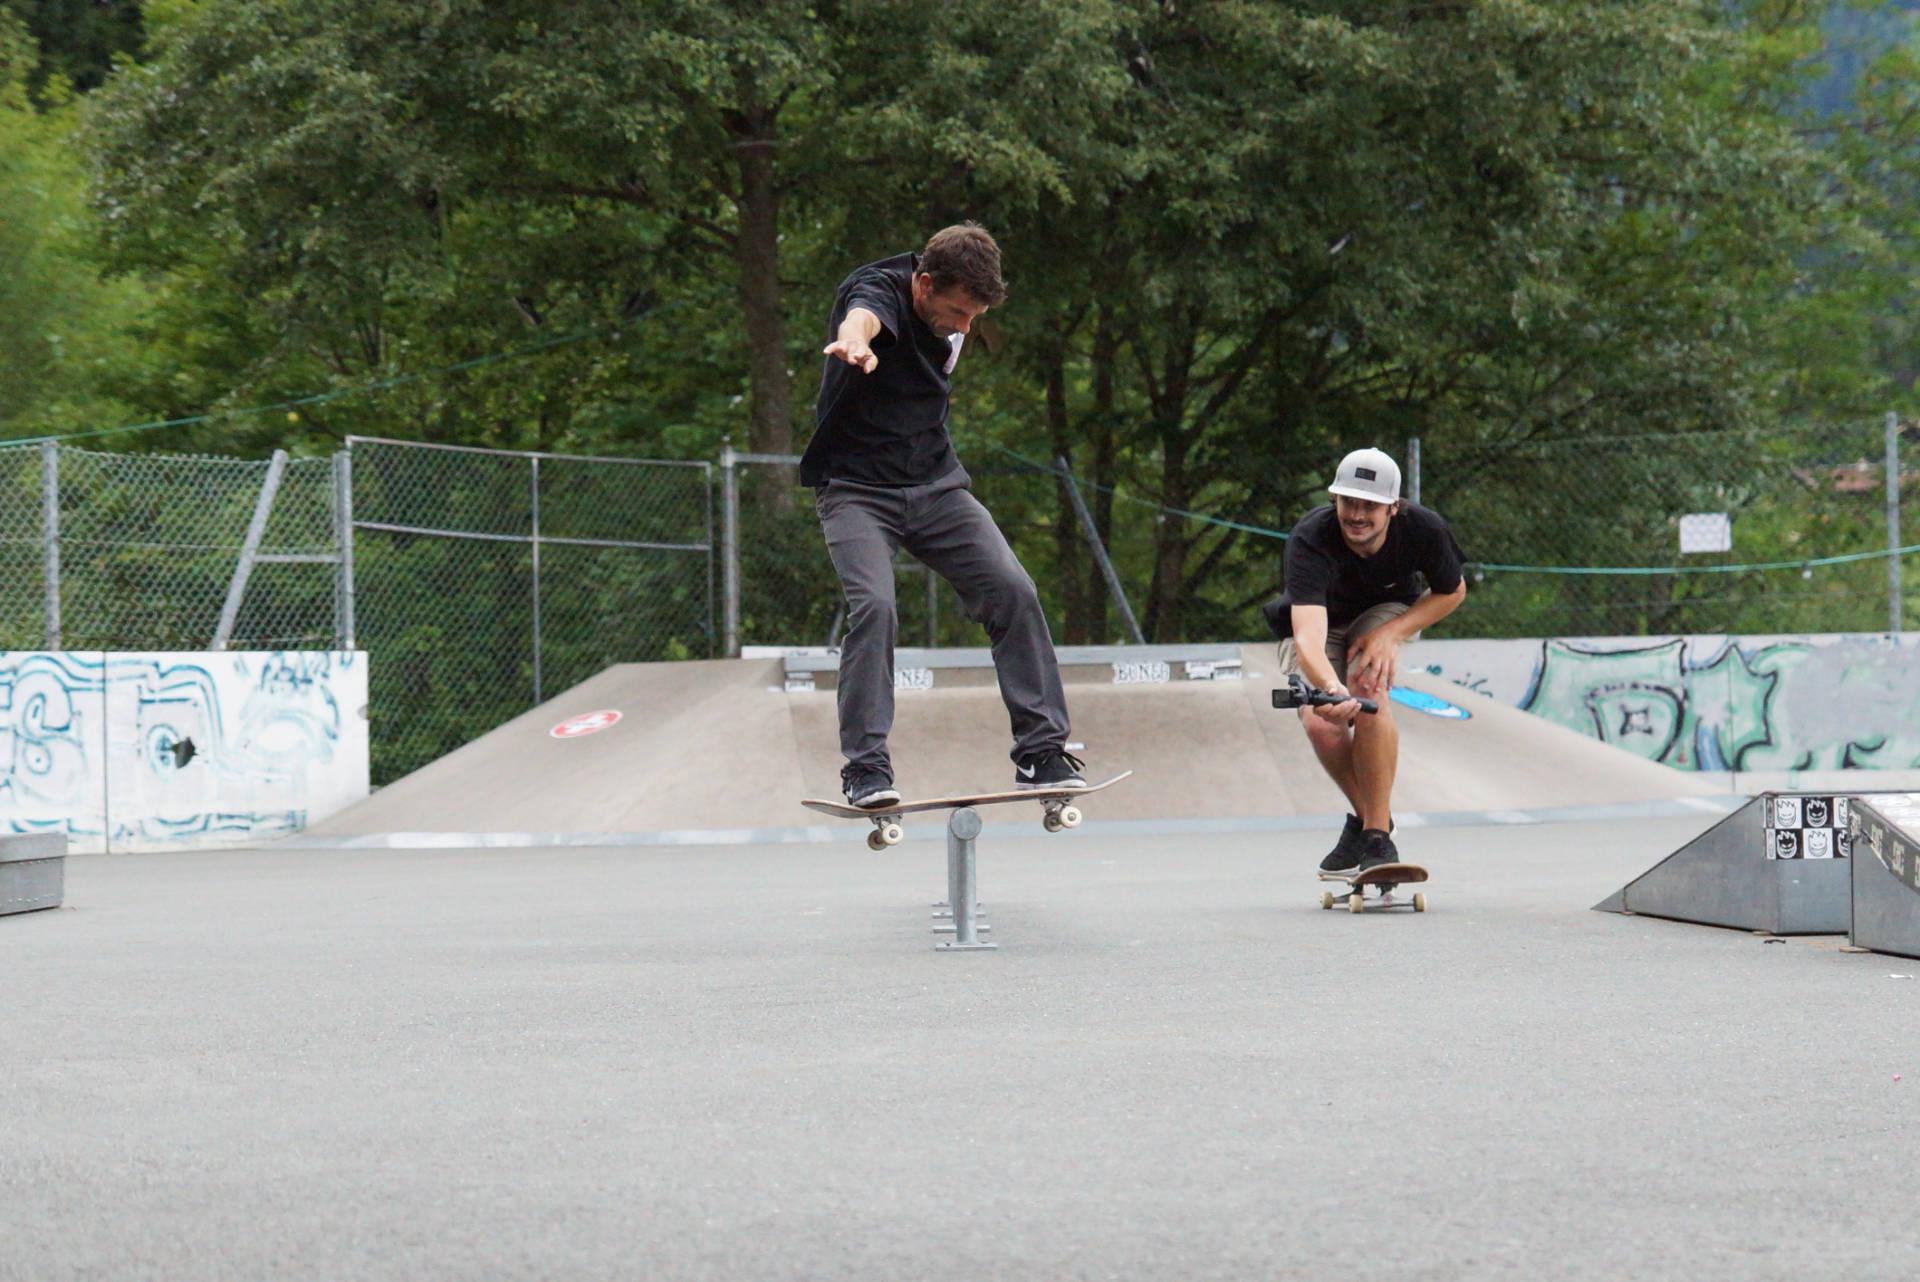 skateboardheadz fieberbrunn kgt 2019 finale 00012